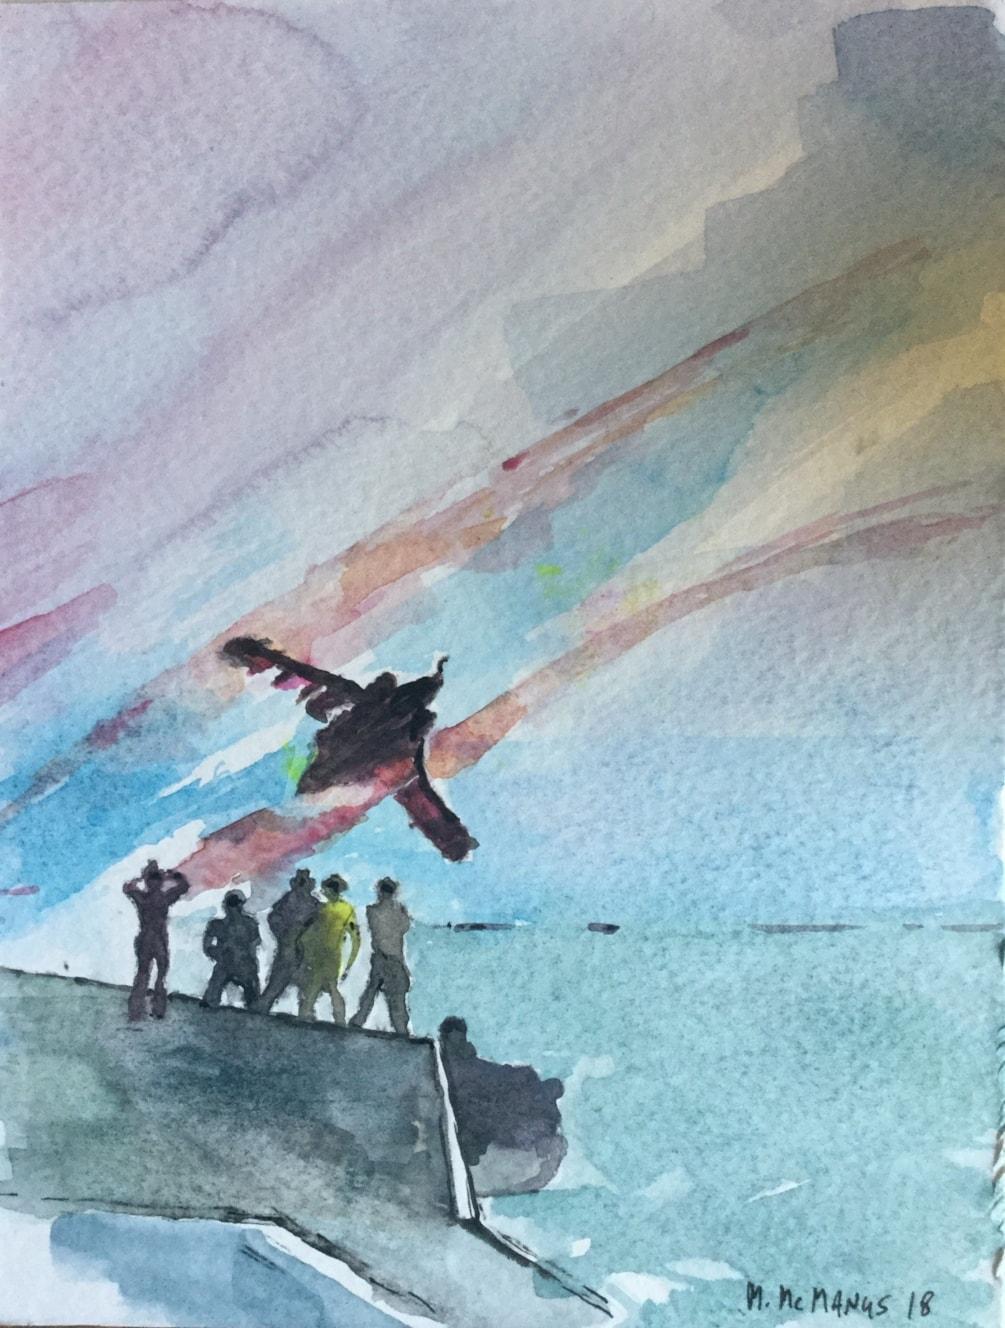 Flightdeck fly-past